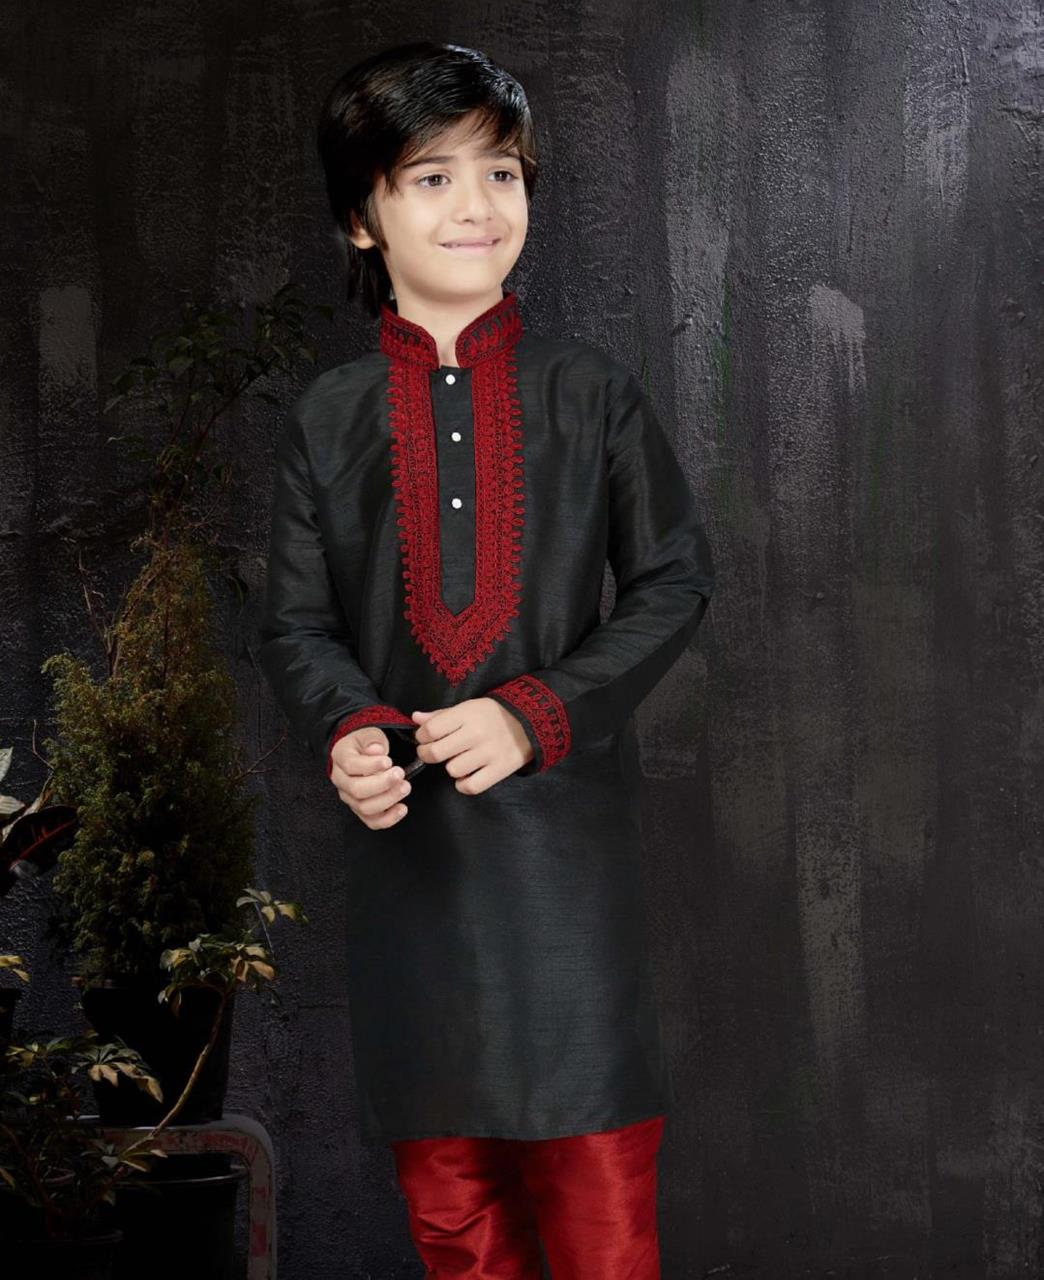 Magnificent Black Kids Blazer and Suits